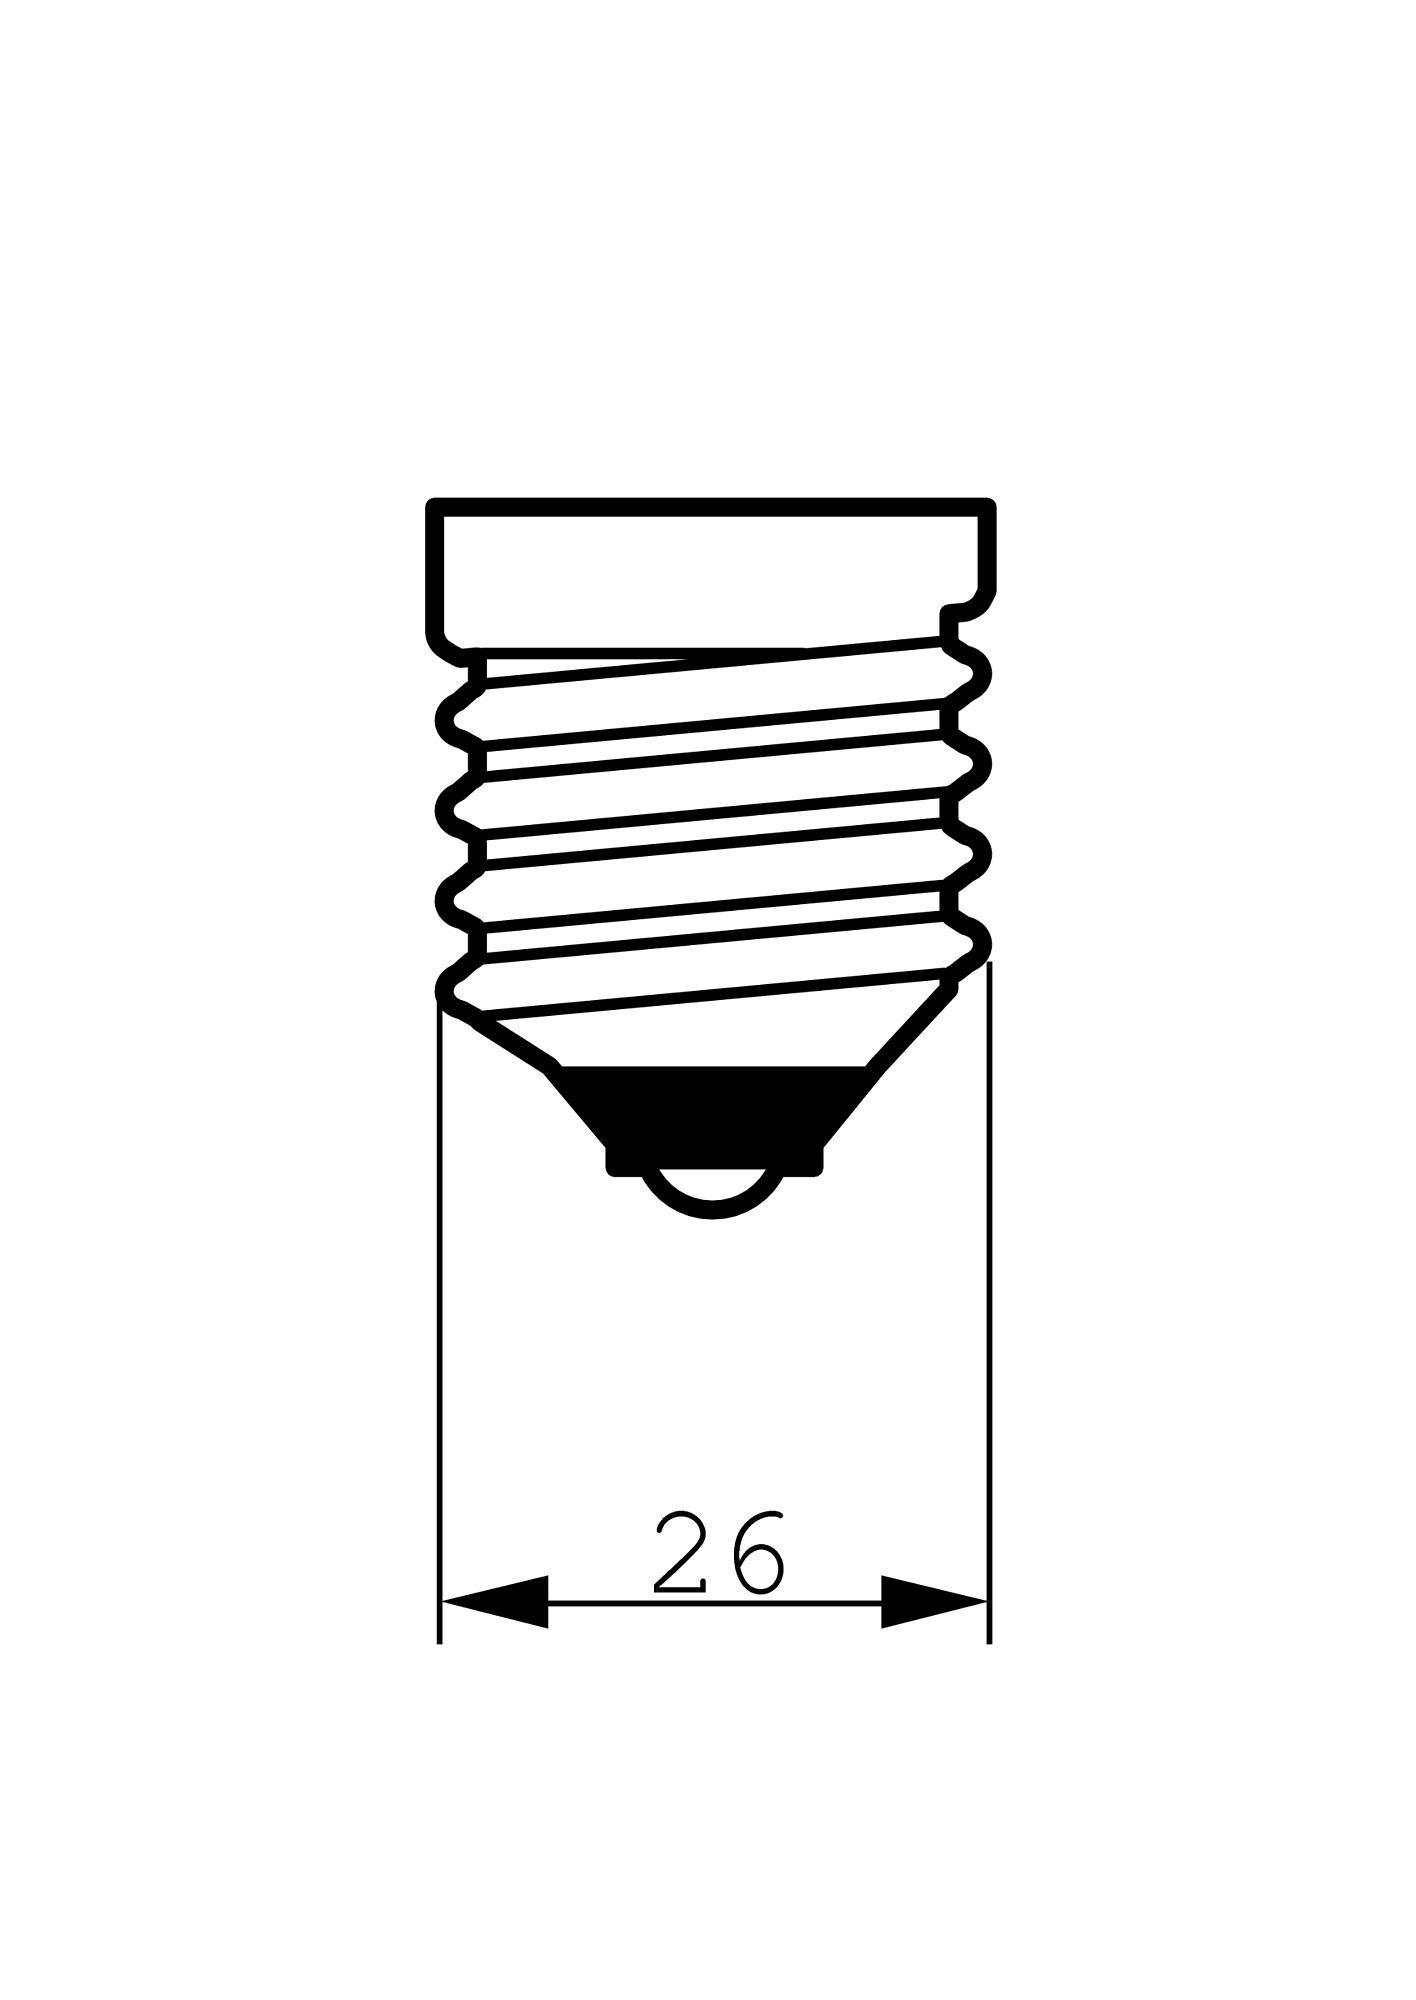 PHILIPS 111724 Incandescent Lamp A19 100 W E26 Medium